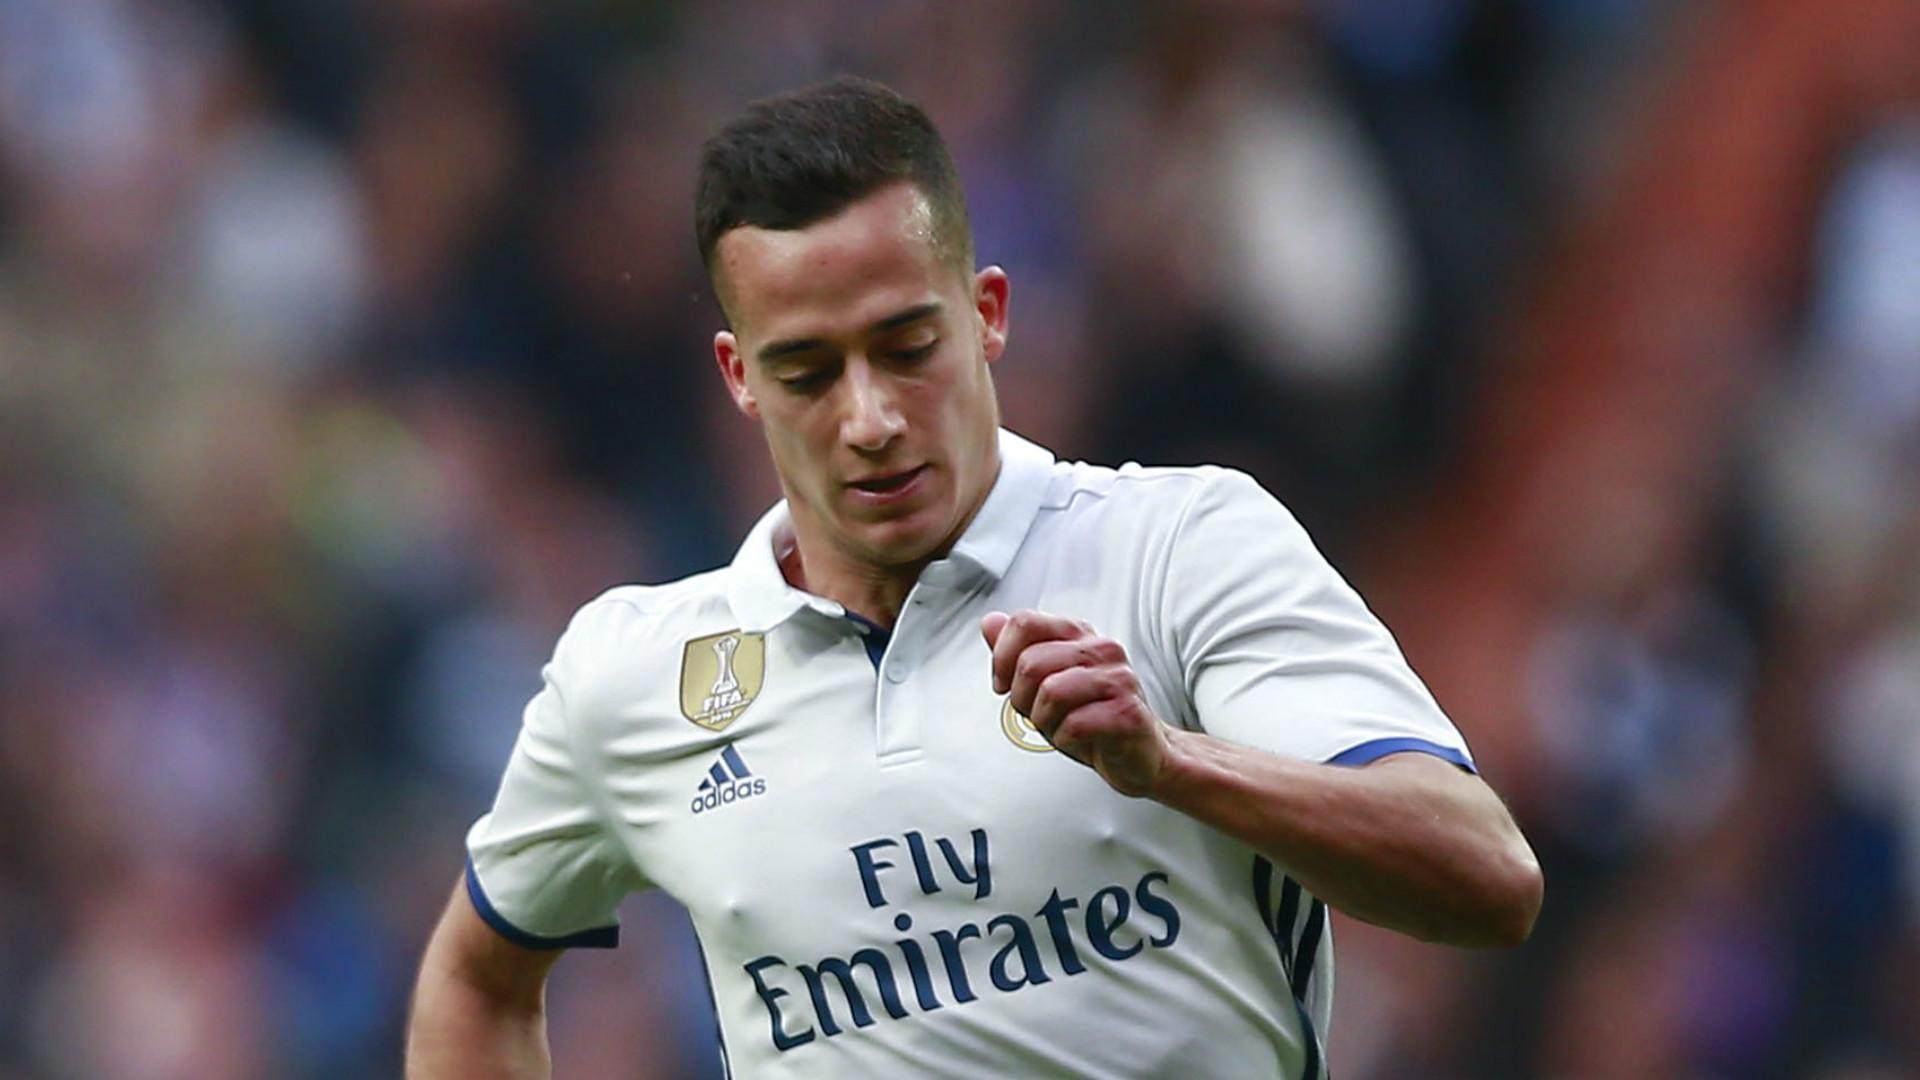 Madrid - Ligue des champions: Cristiano Ronaldo premier à marquer 100 buts